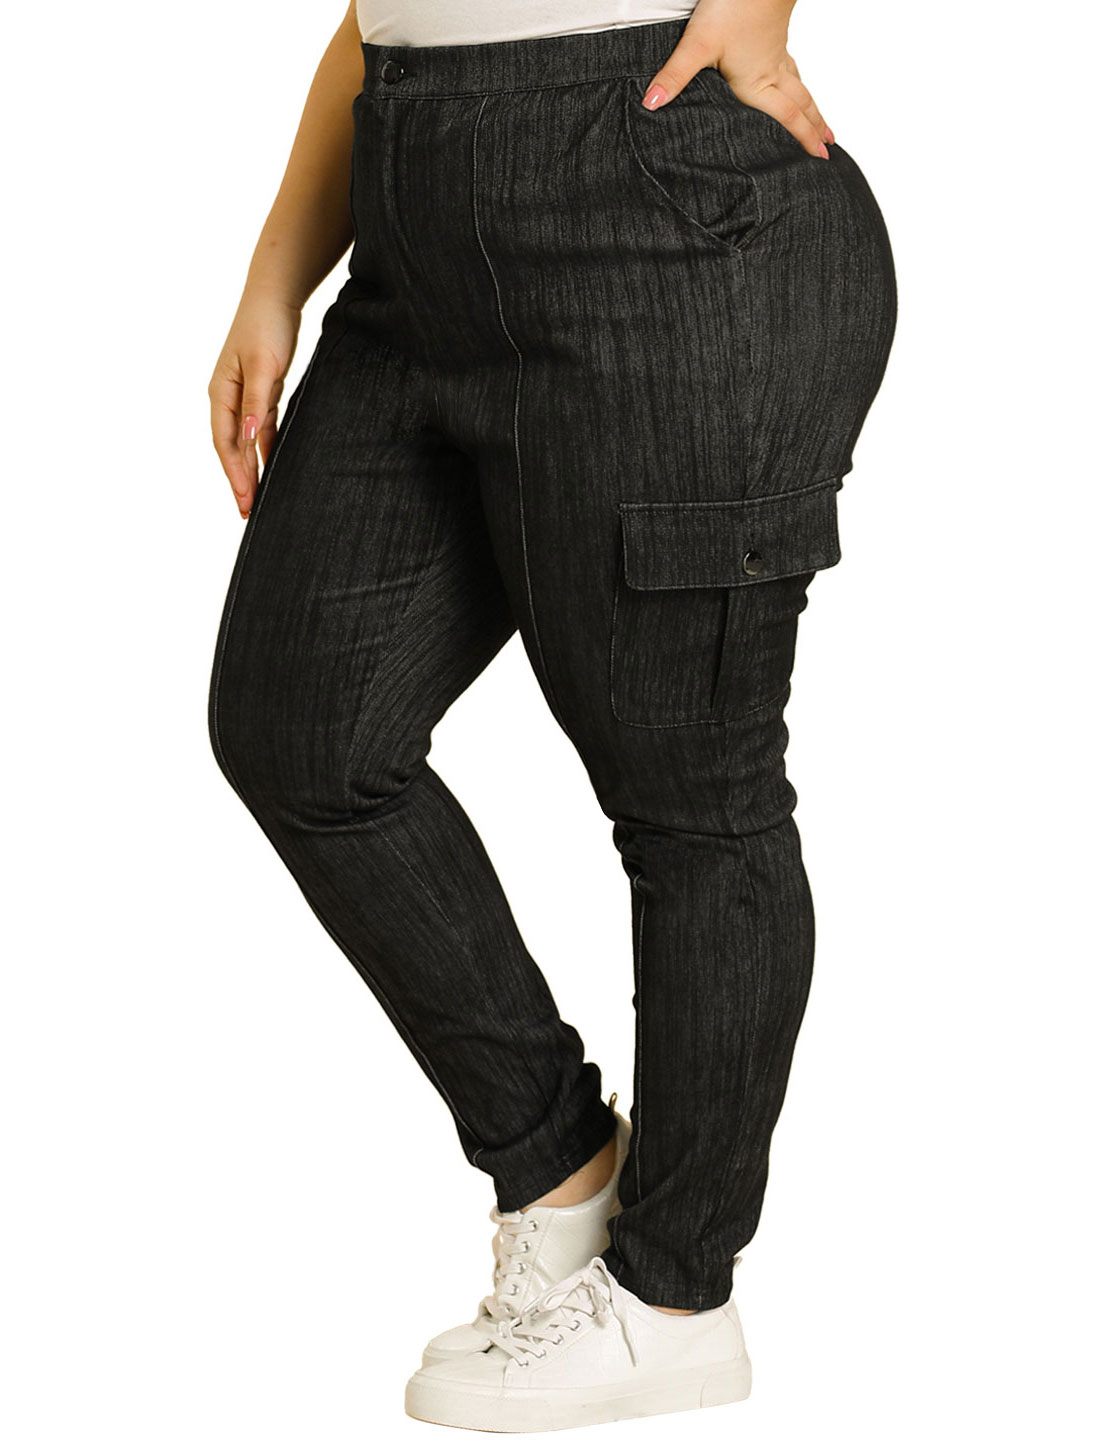 Women's Plus Size Joggers Skinny Contrast Color Ponte Casual Pants Black 2X